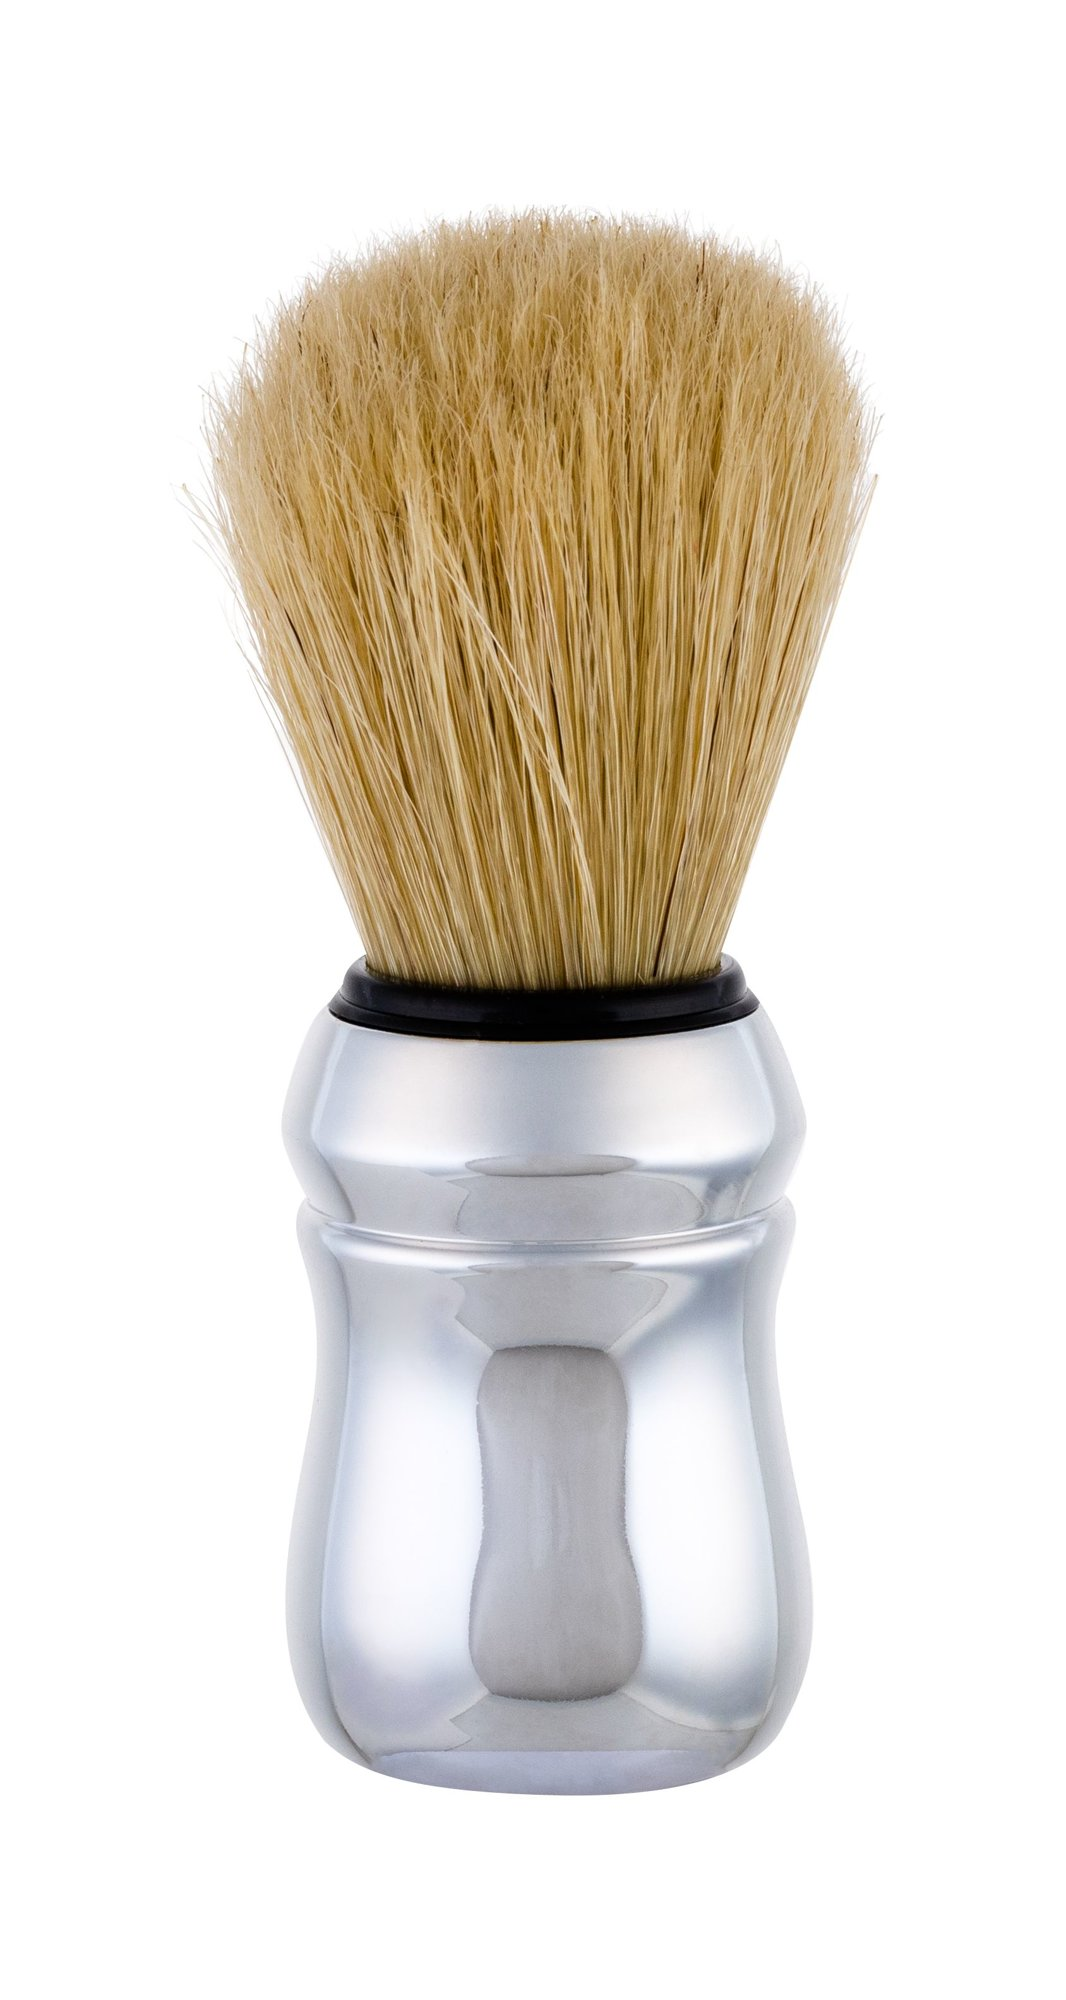 PRORASO Green Beard Brush 1ml  Shaving Brush